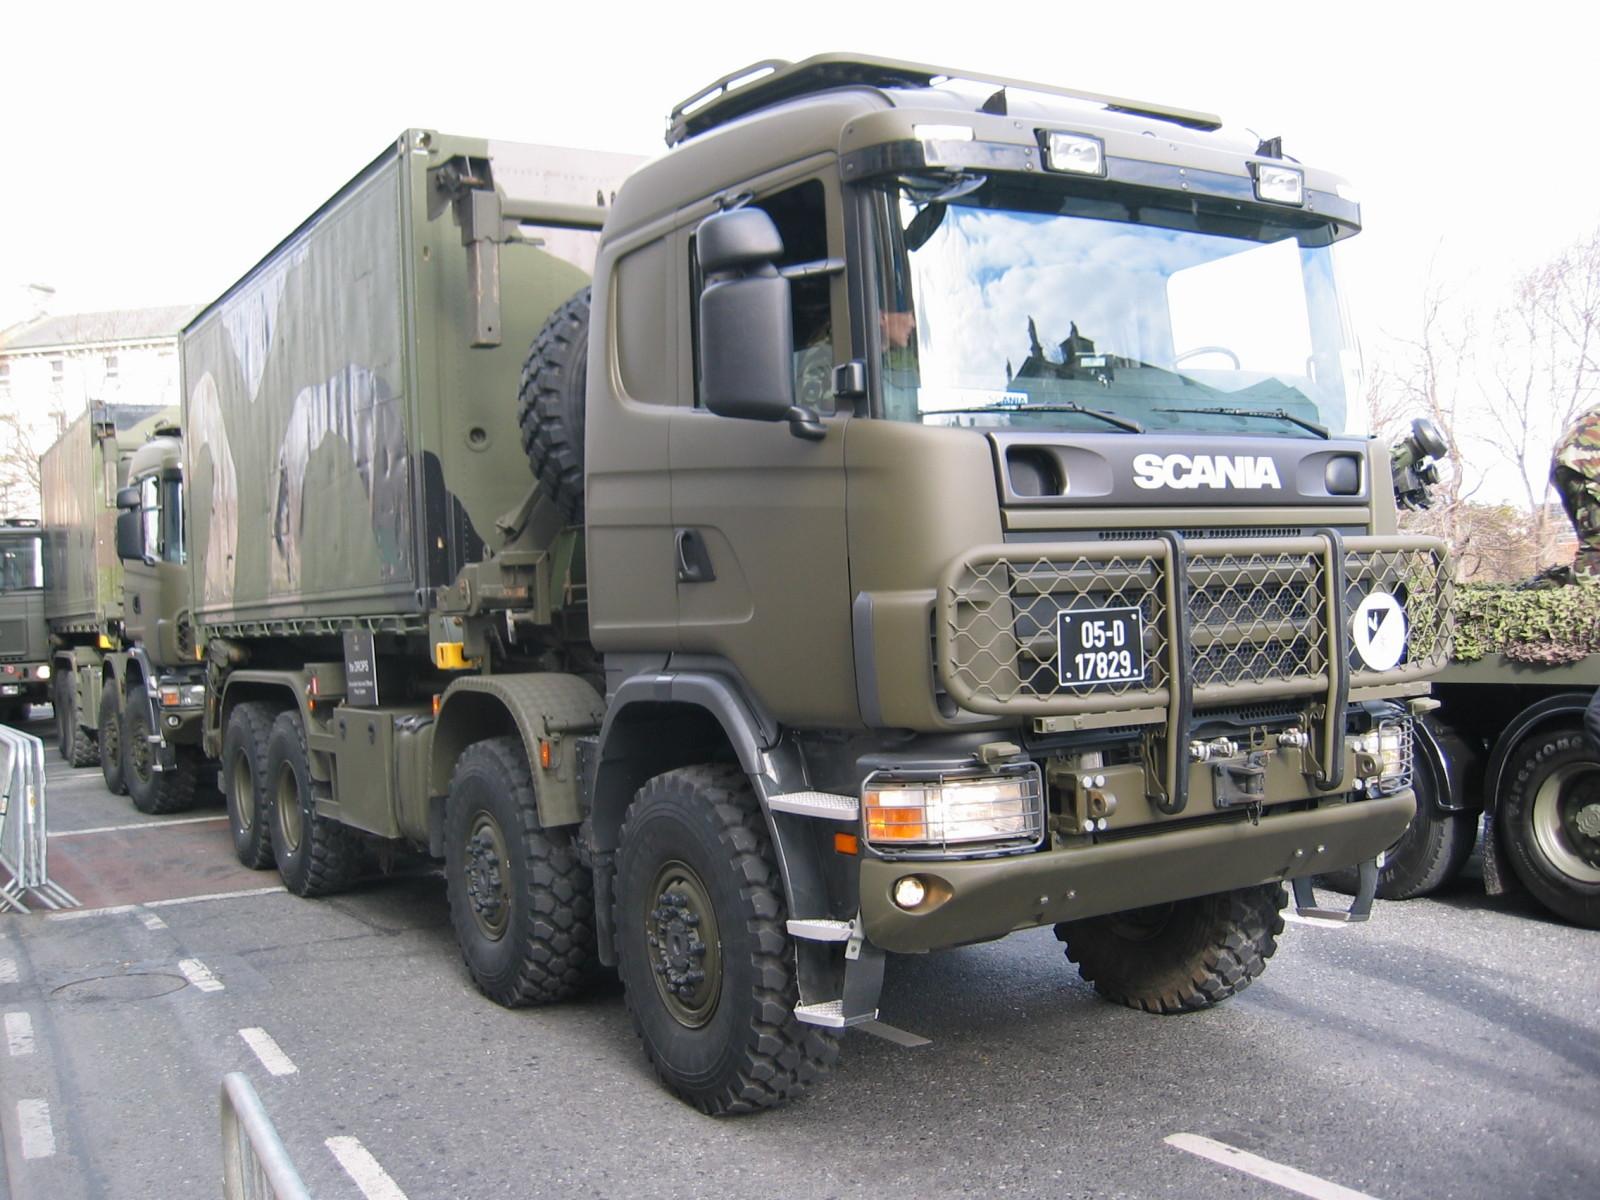 Modern Vehicles Of The Irish Army